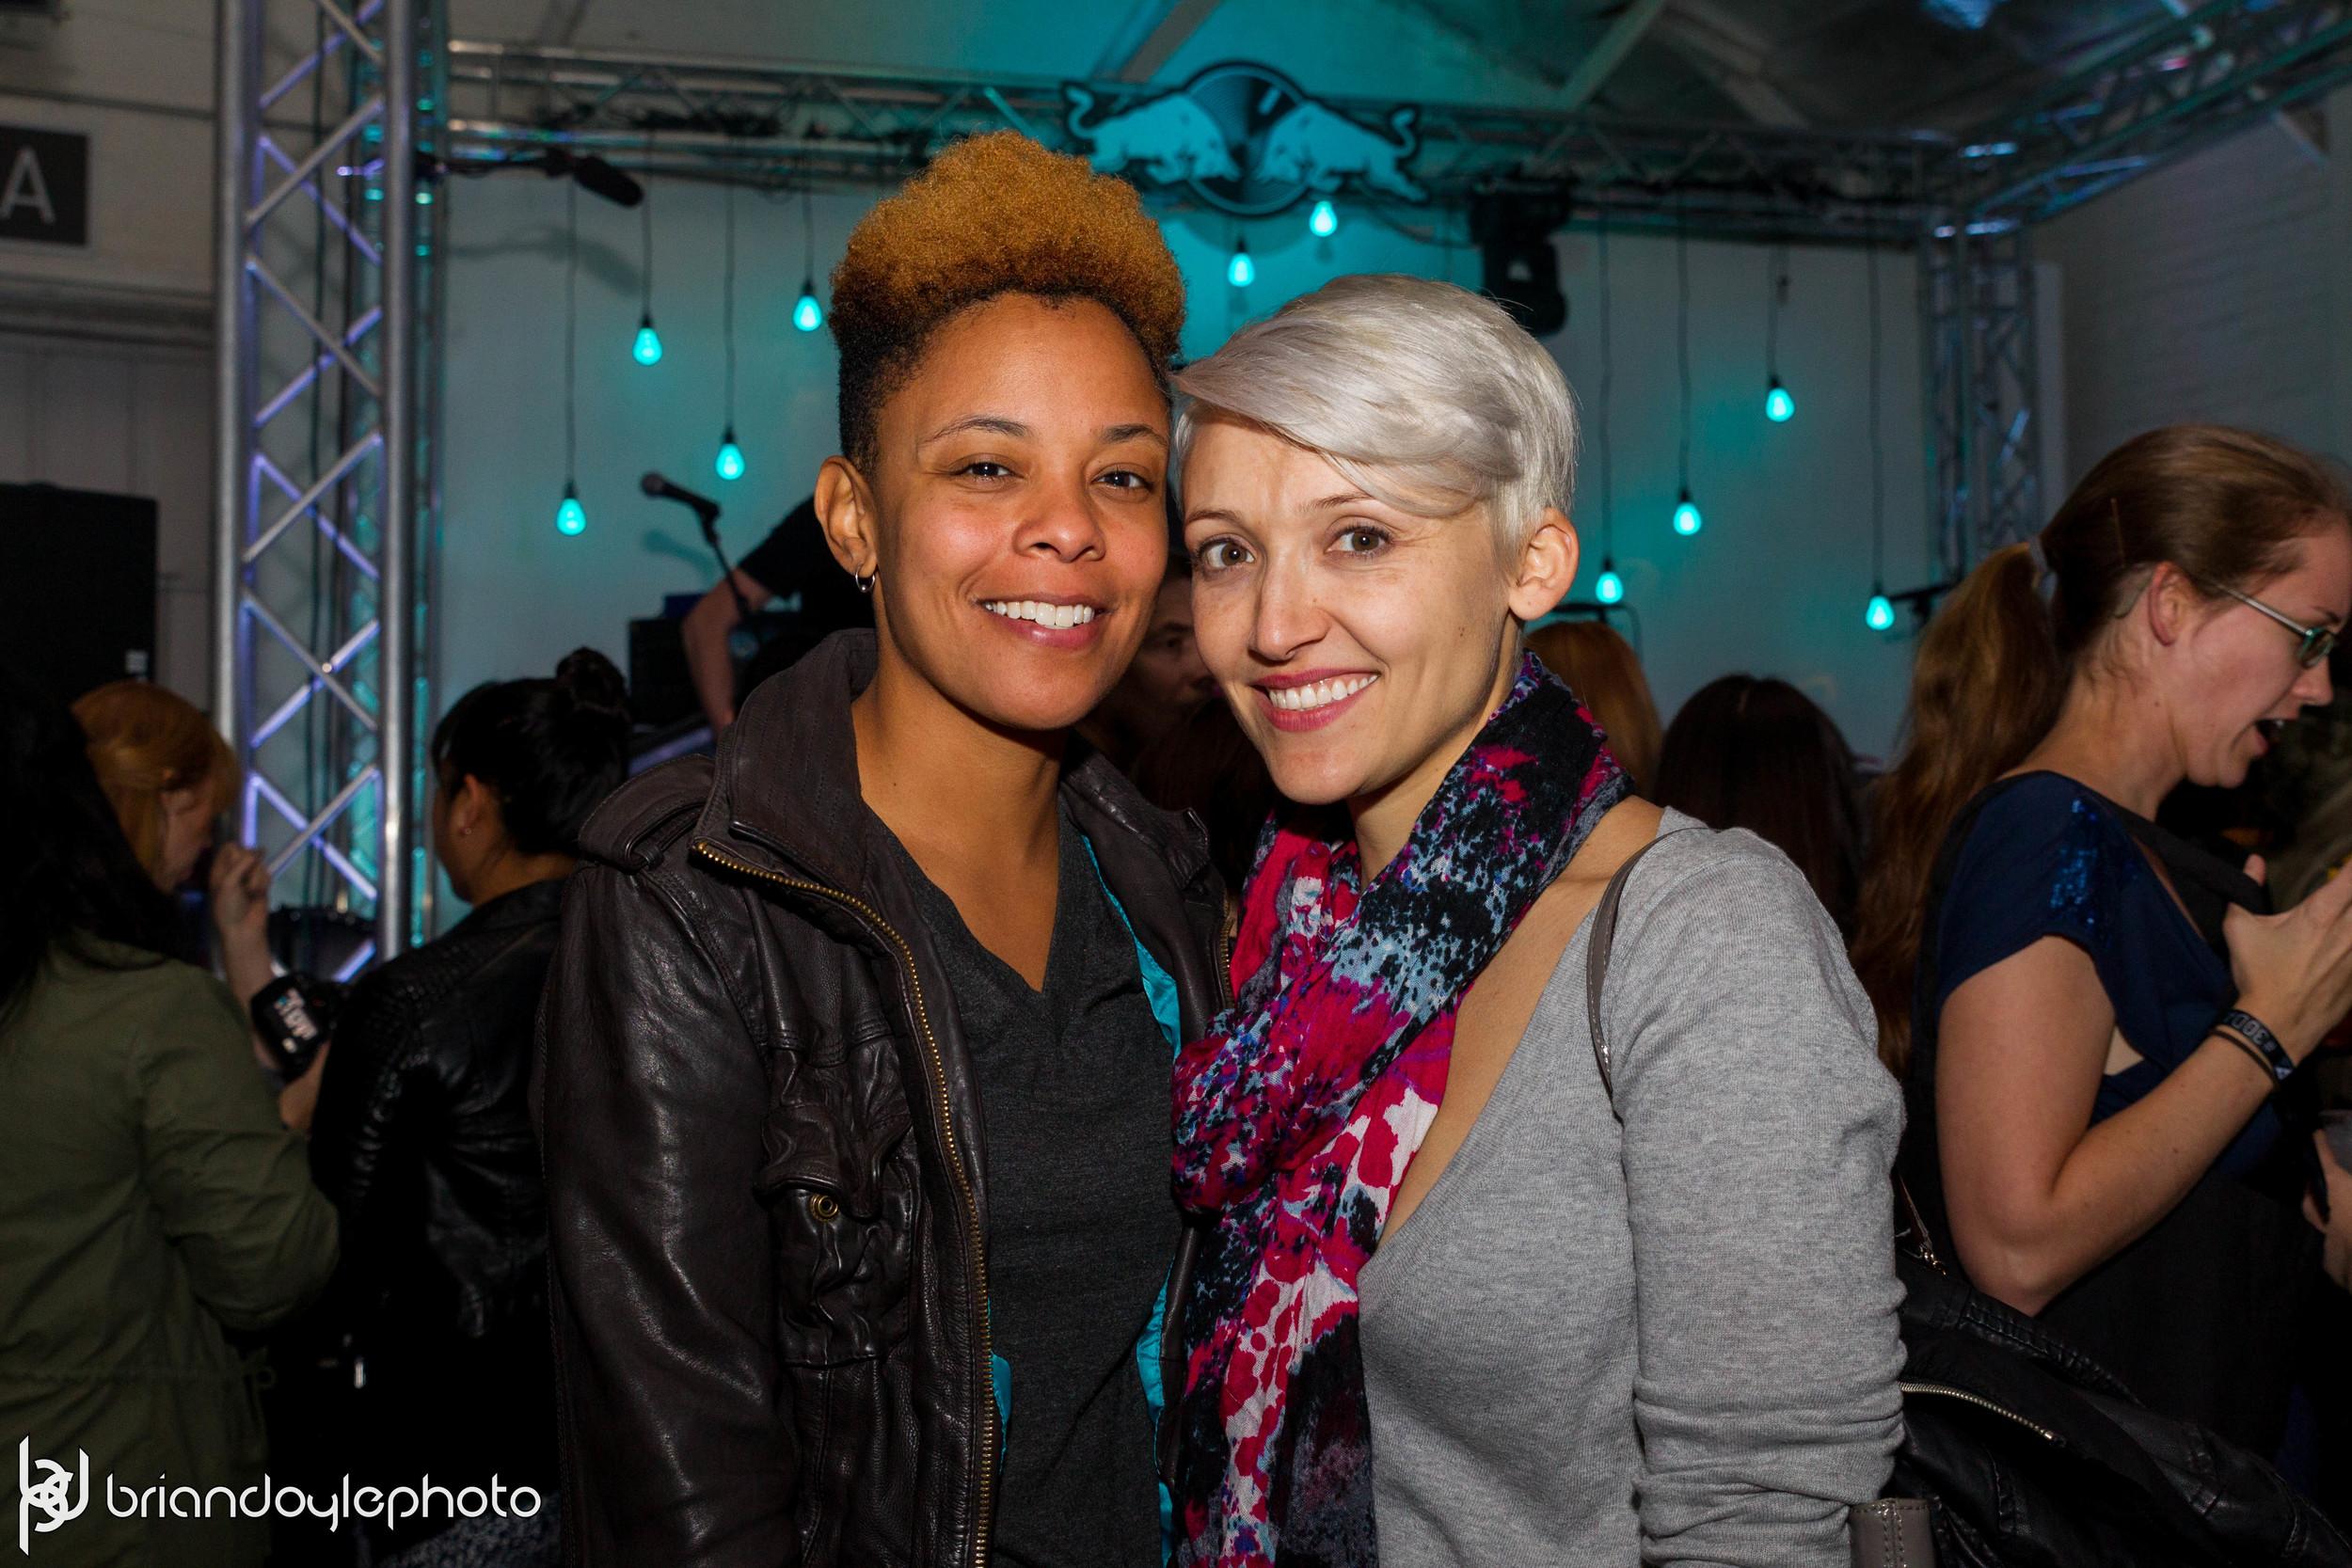 Red Bull - Dum Dum Girls, Tropicana and the Flea, Lowell @ The Well 2014.11.16-16.jpg